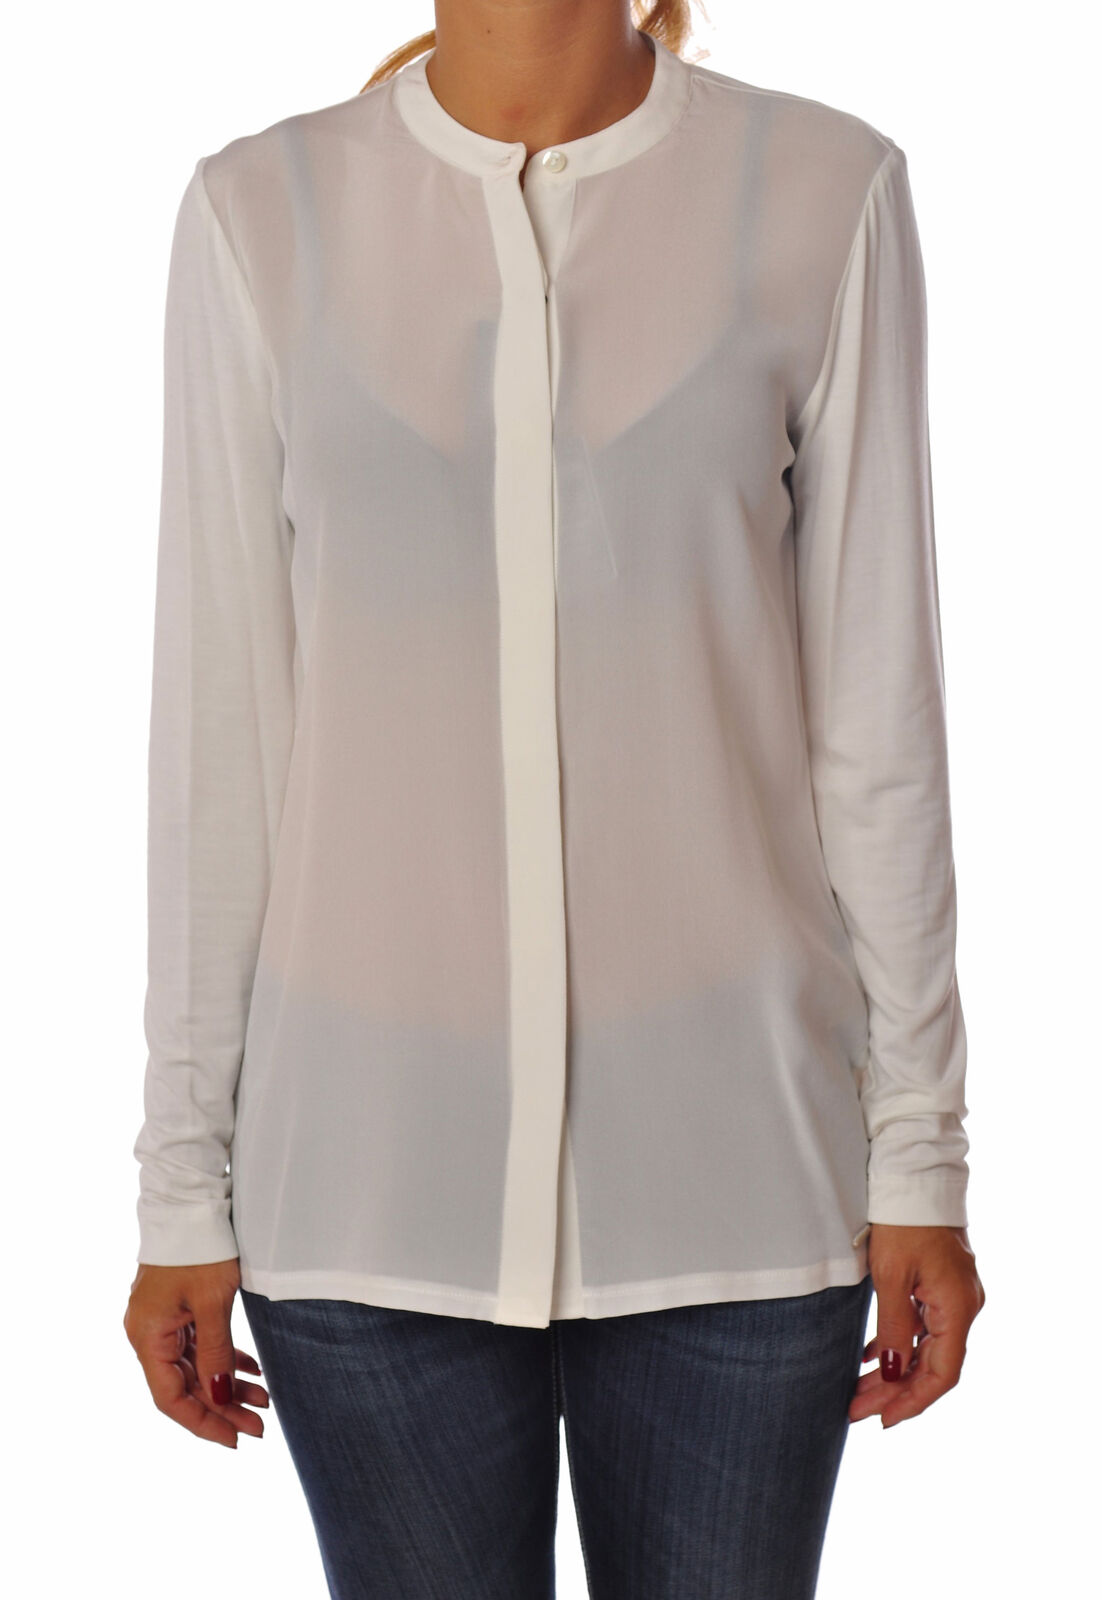 Woolrich  -  Shirt - Female - Beige - 2526226N174140